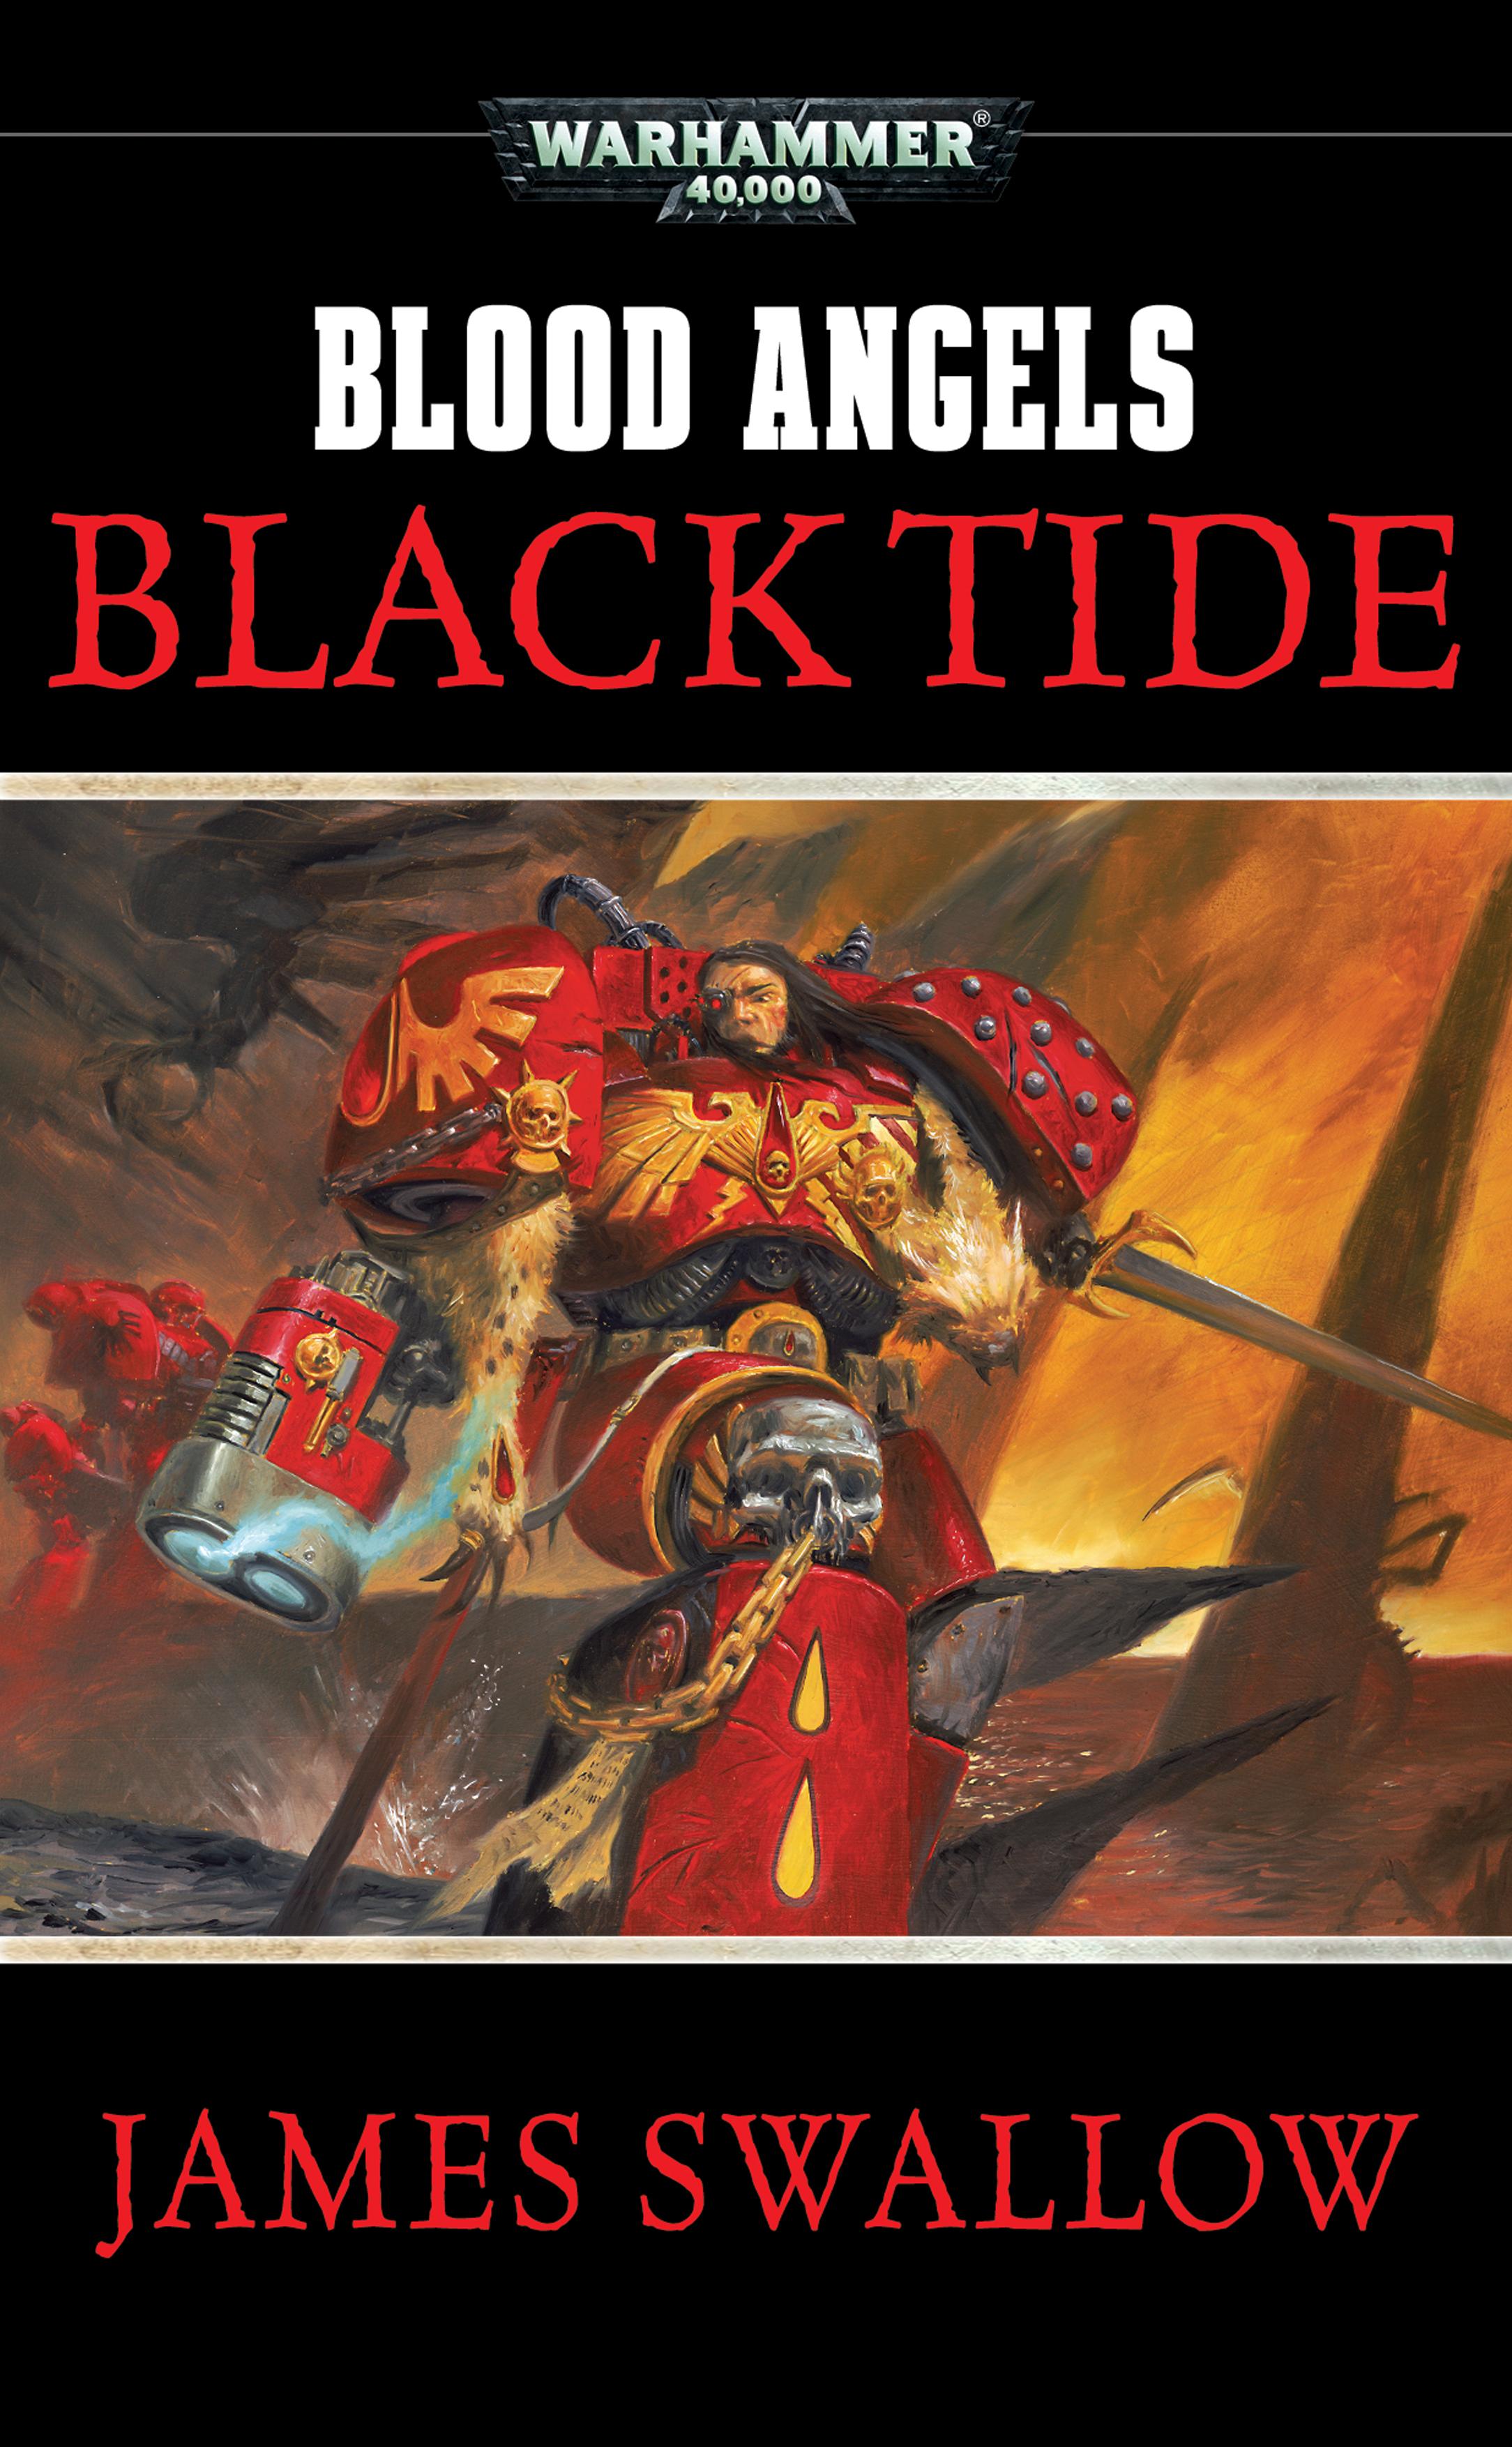 Black Tide by James Swallow